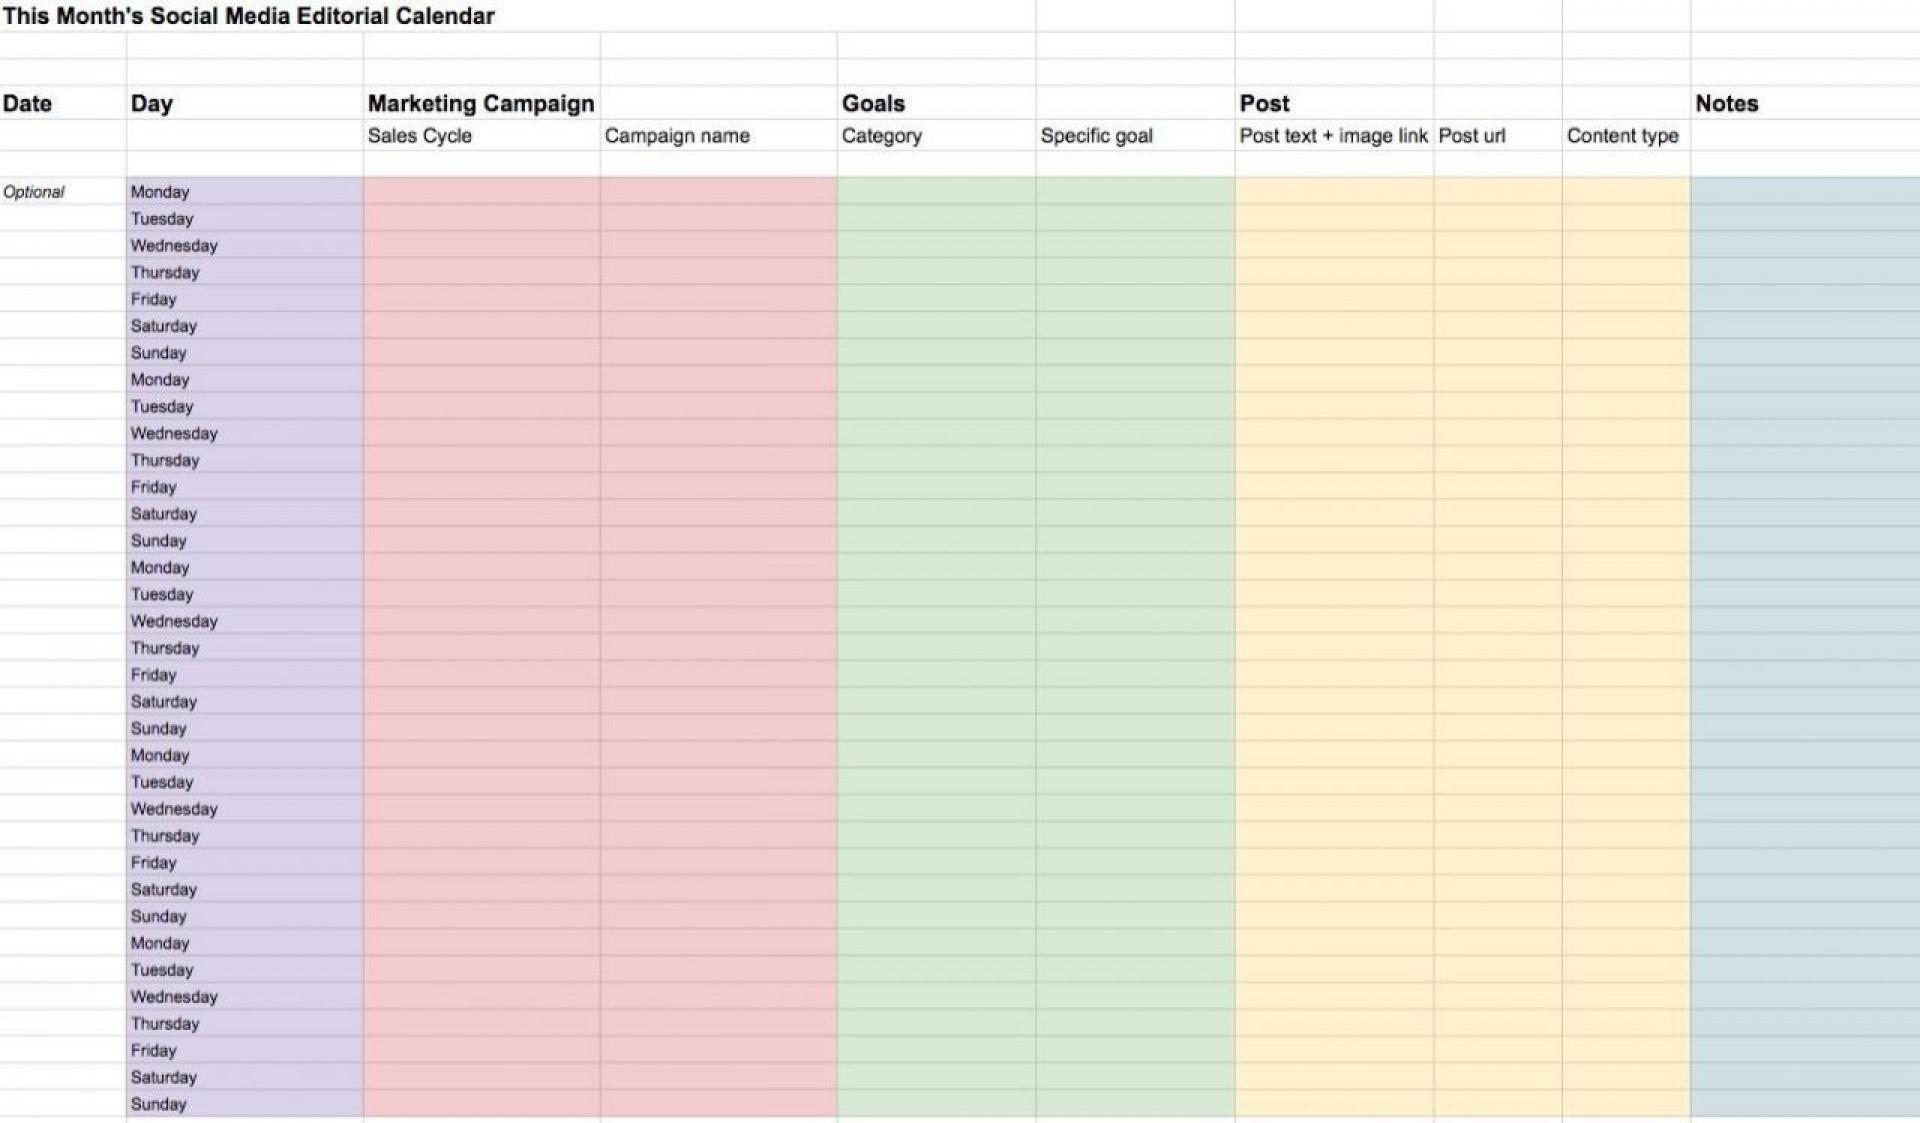 004 Best Social Media Planning Template Image  Plan Sample Pdf Hubspot Excel Free Download1920